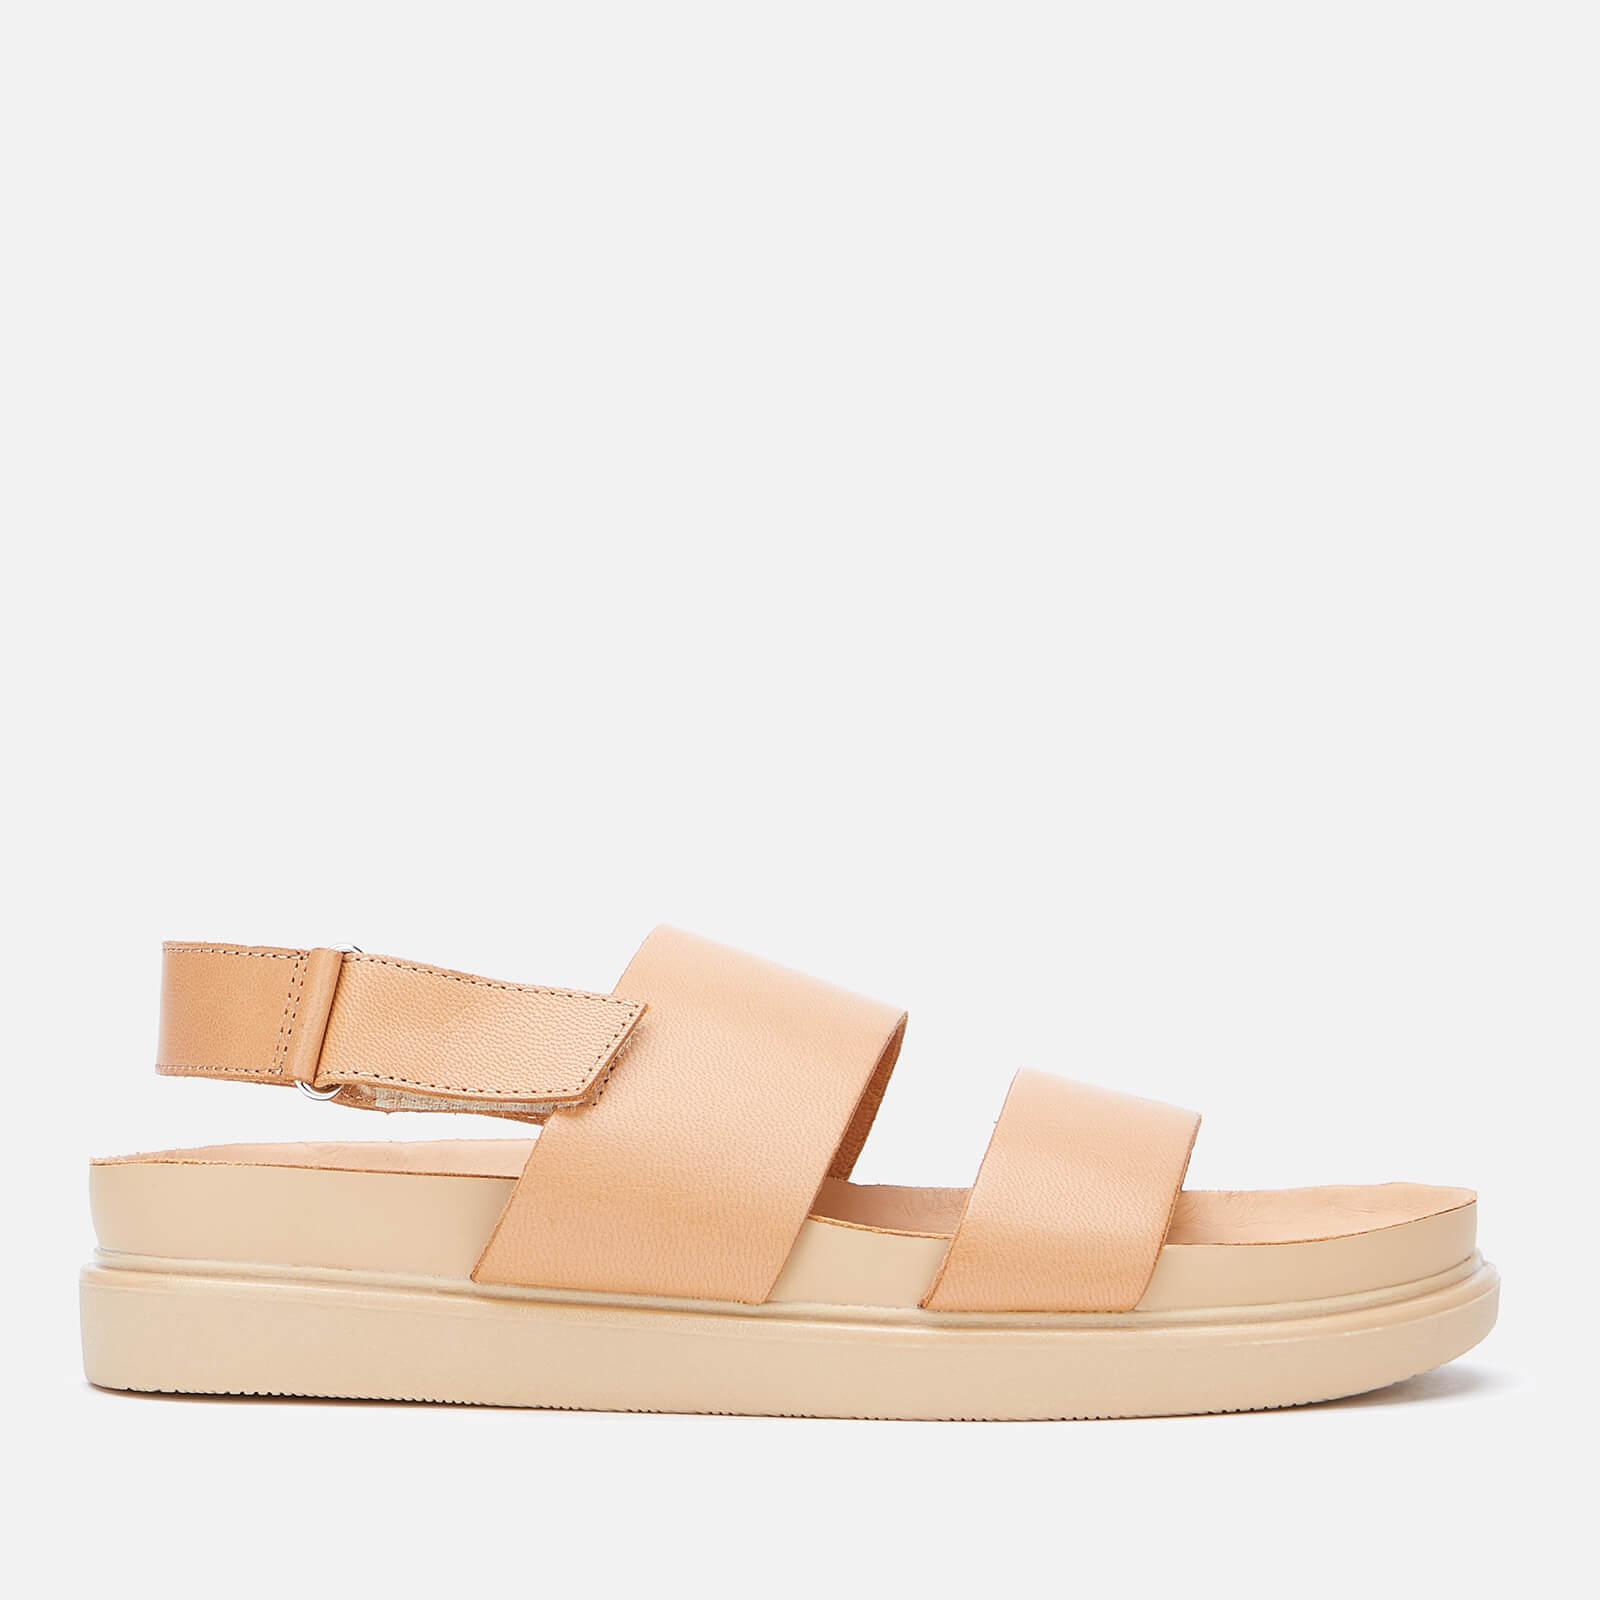 Vagabond Women's Erin Leather Flat Sandals - Natural - Uk 3